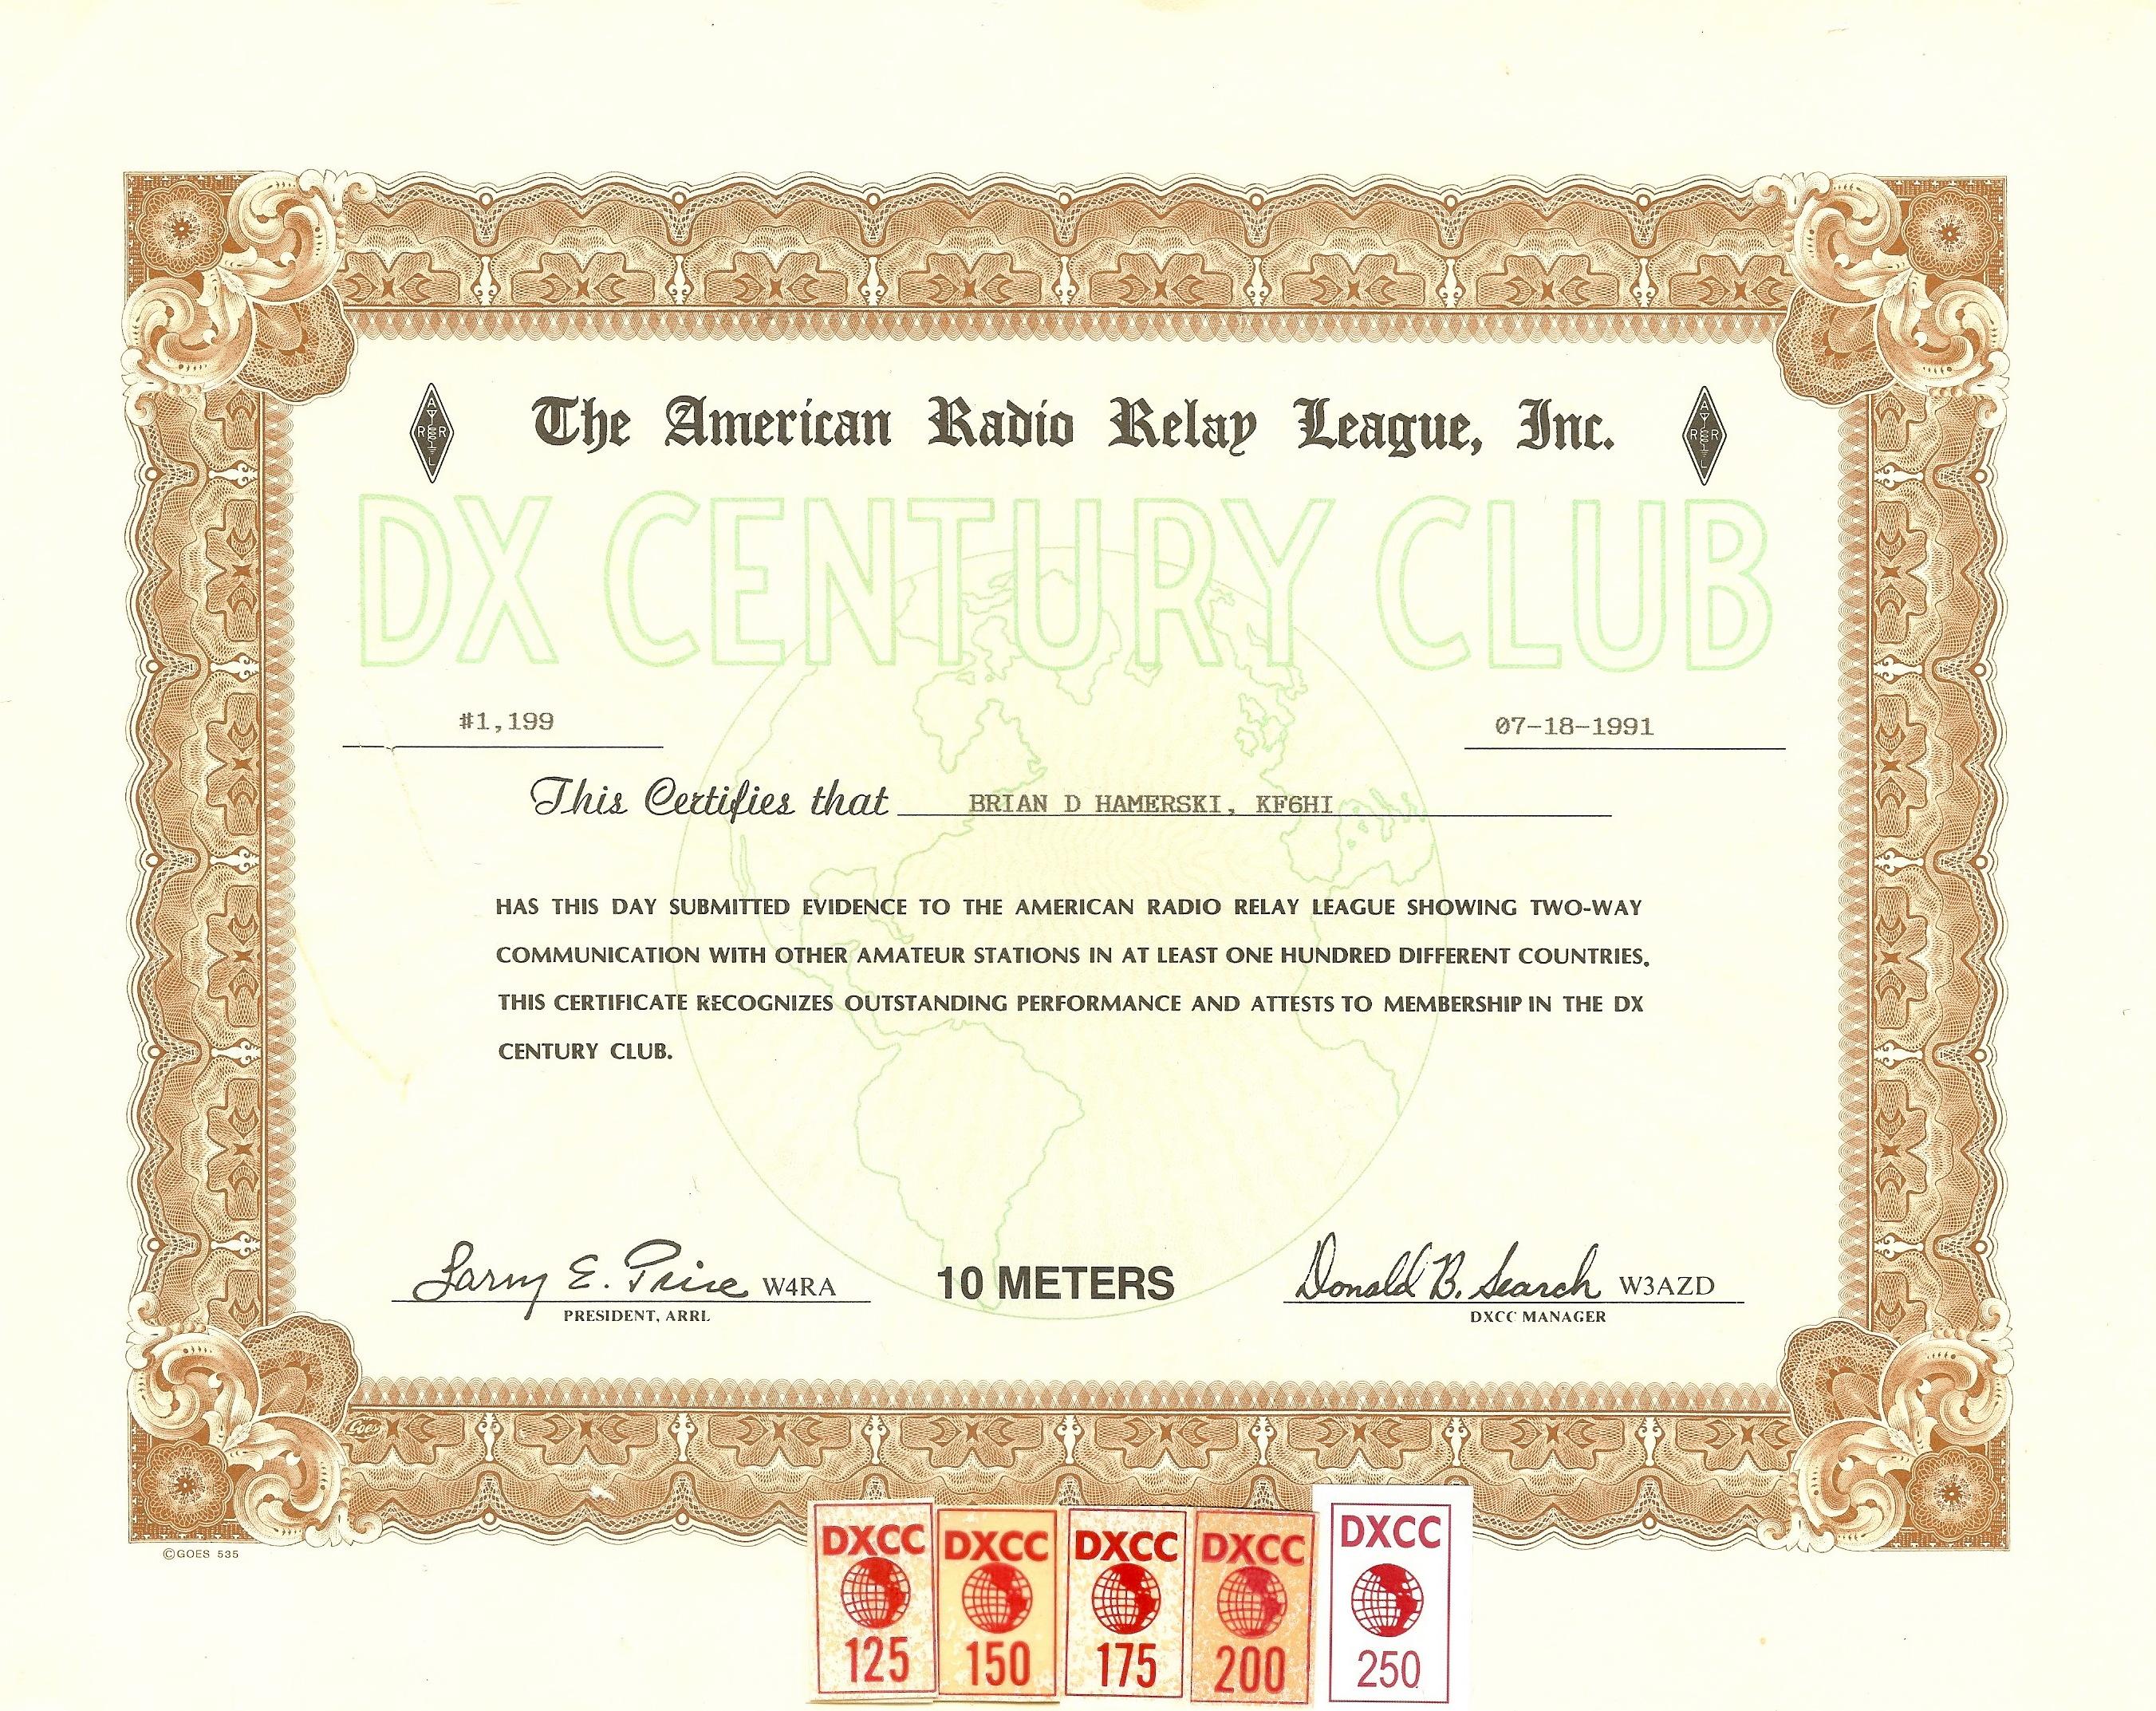 KF6HI Achievements